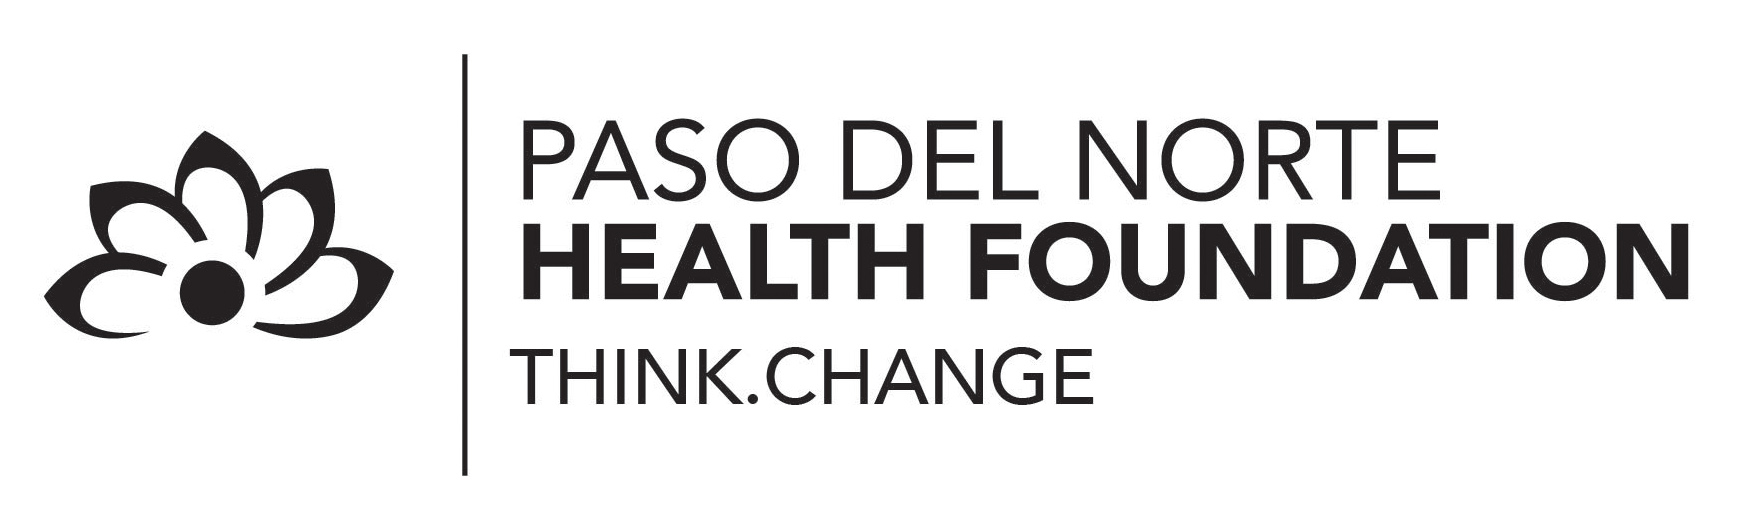 Paso del Norte Health Foundation Think.Change